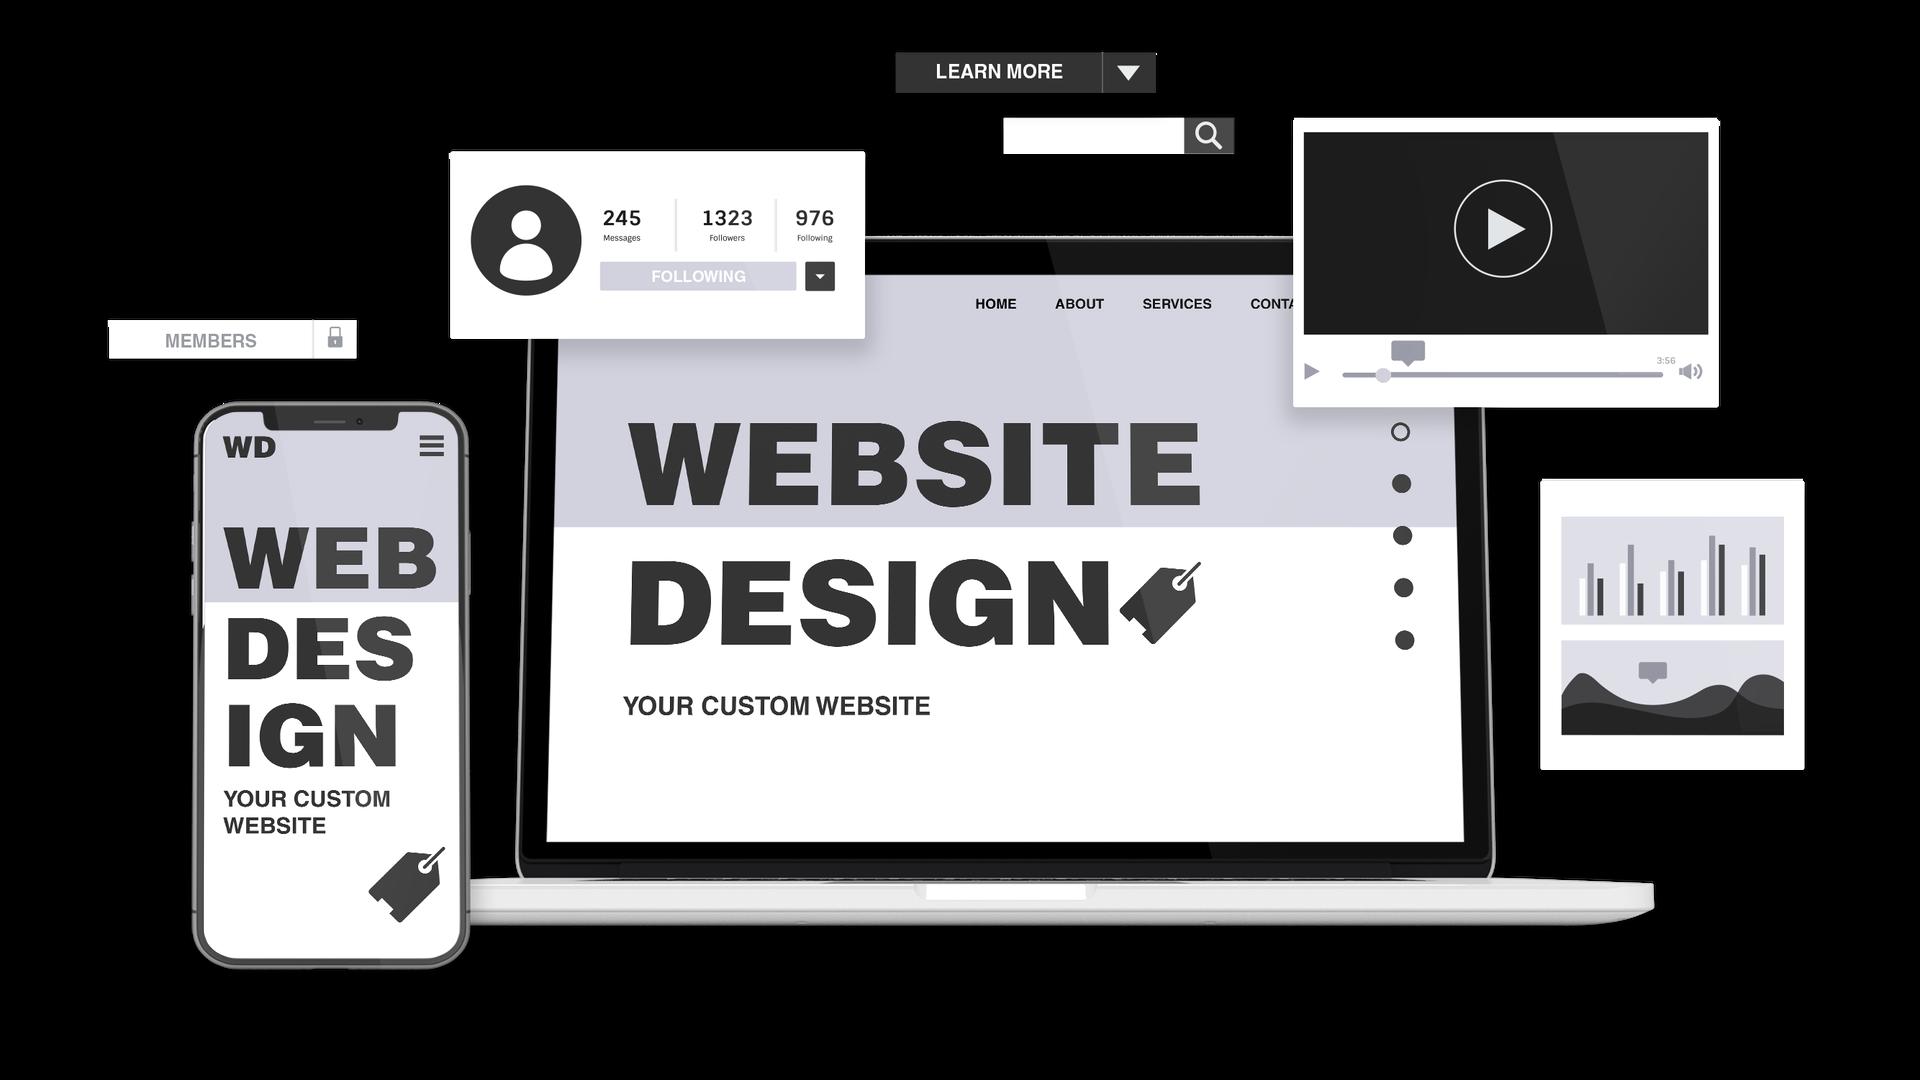 uxui design hero black p.png